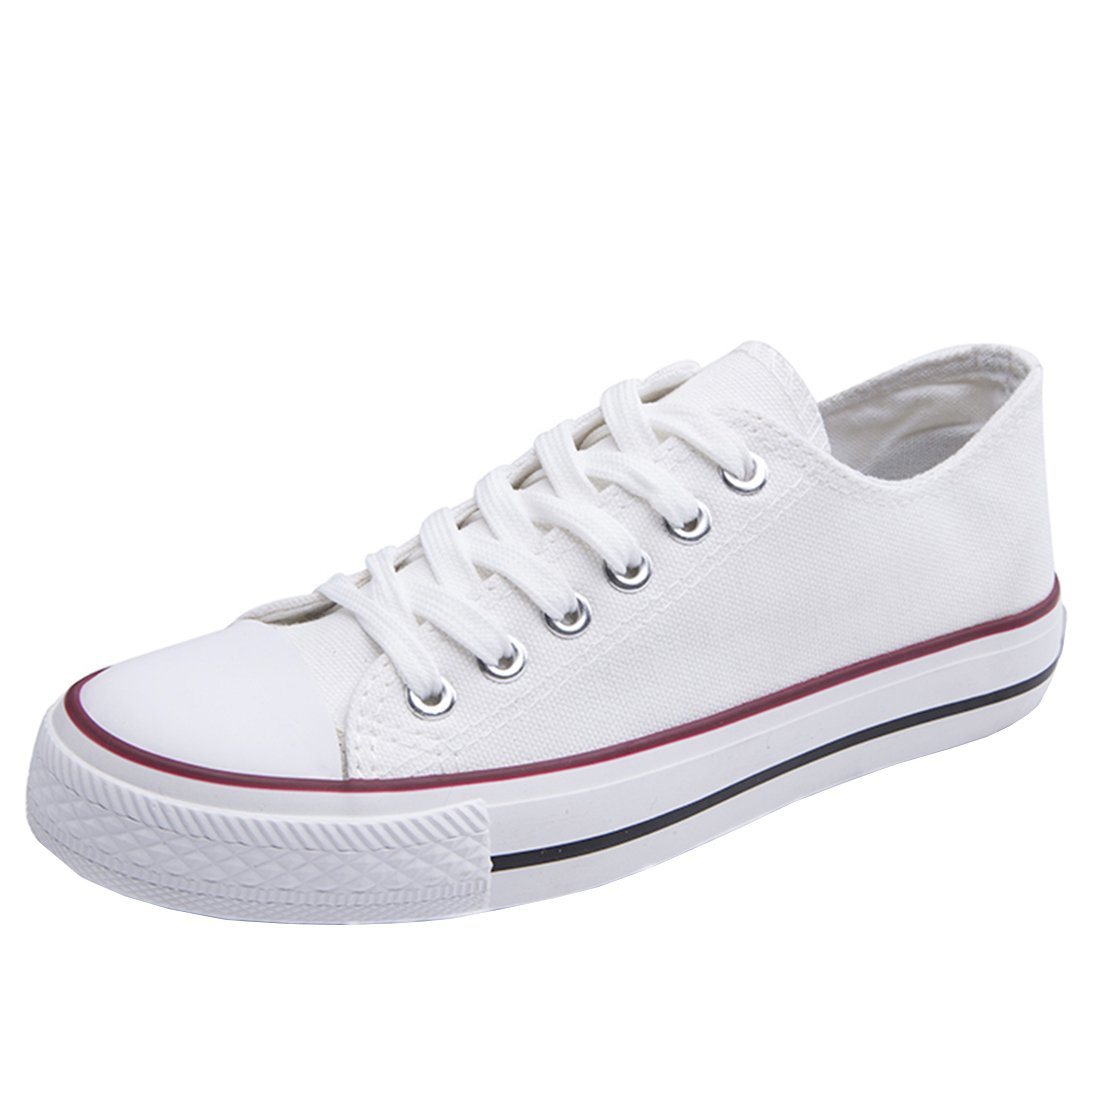 YE Outdoor Chaussure Espadrilles Toile Blanc Plates Outdoor Femme Sneakers Sport YE Shoes Woman à Lacet Plateforme Confor Blanc bea589e - piero.space